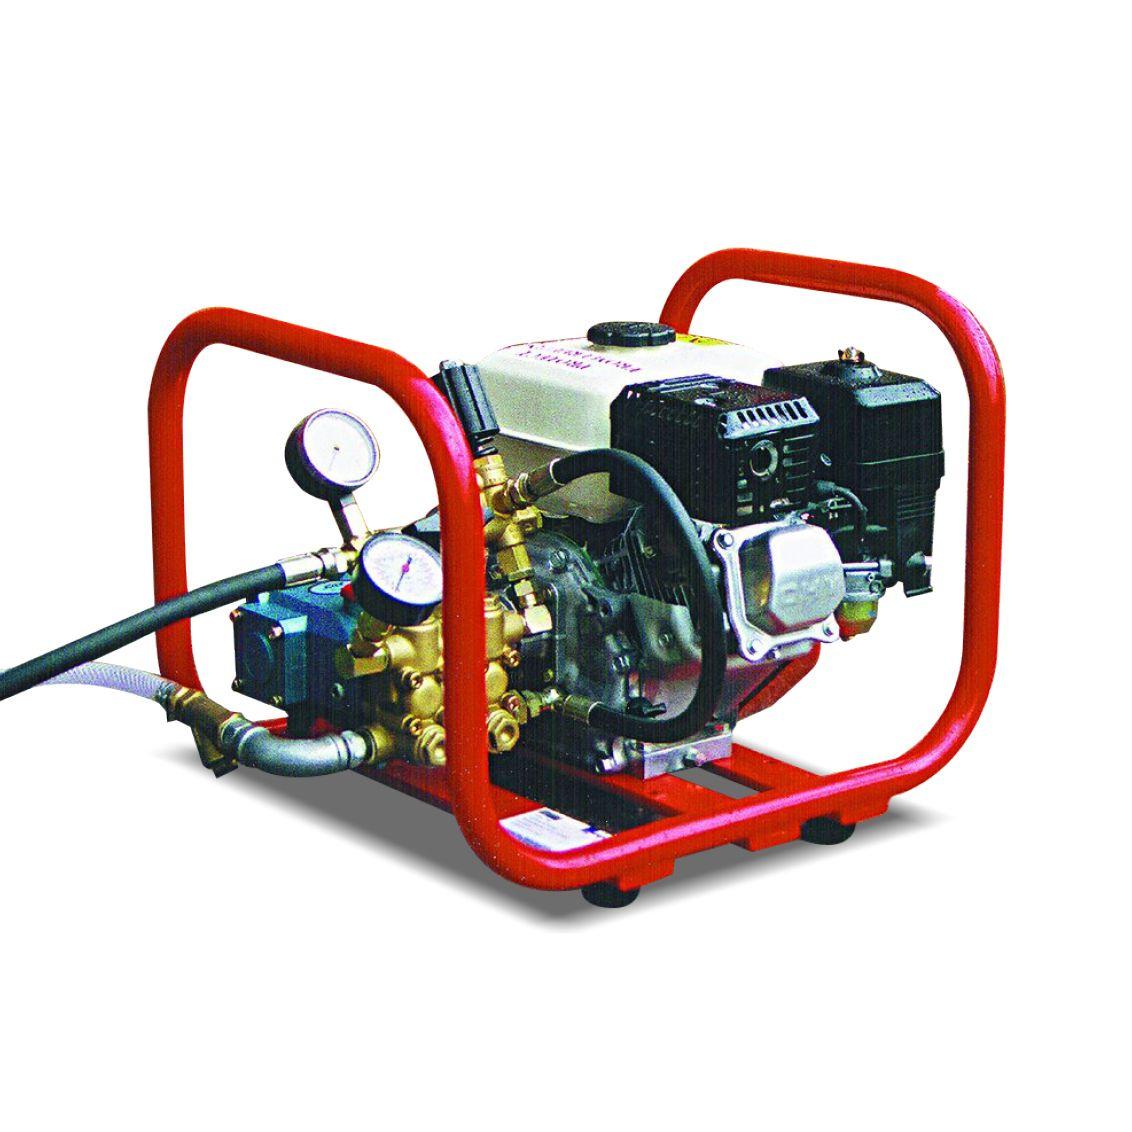 Hilta Pressure Tester 1500P